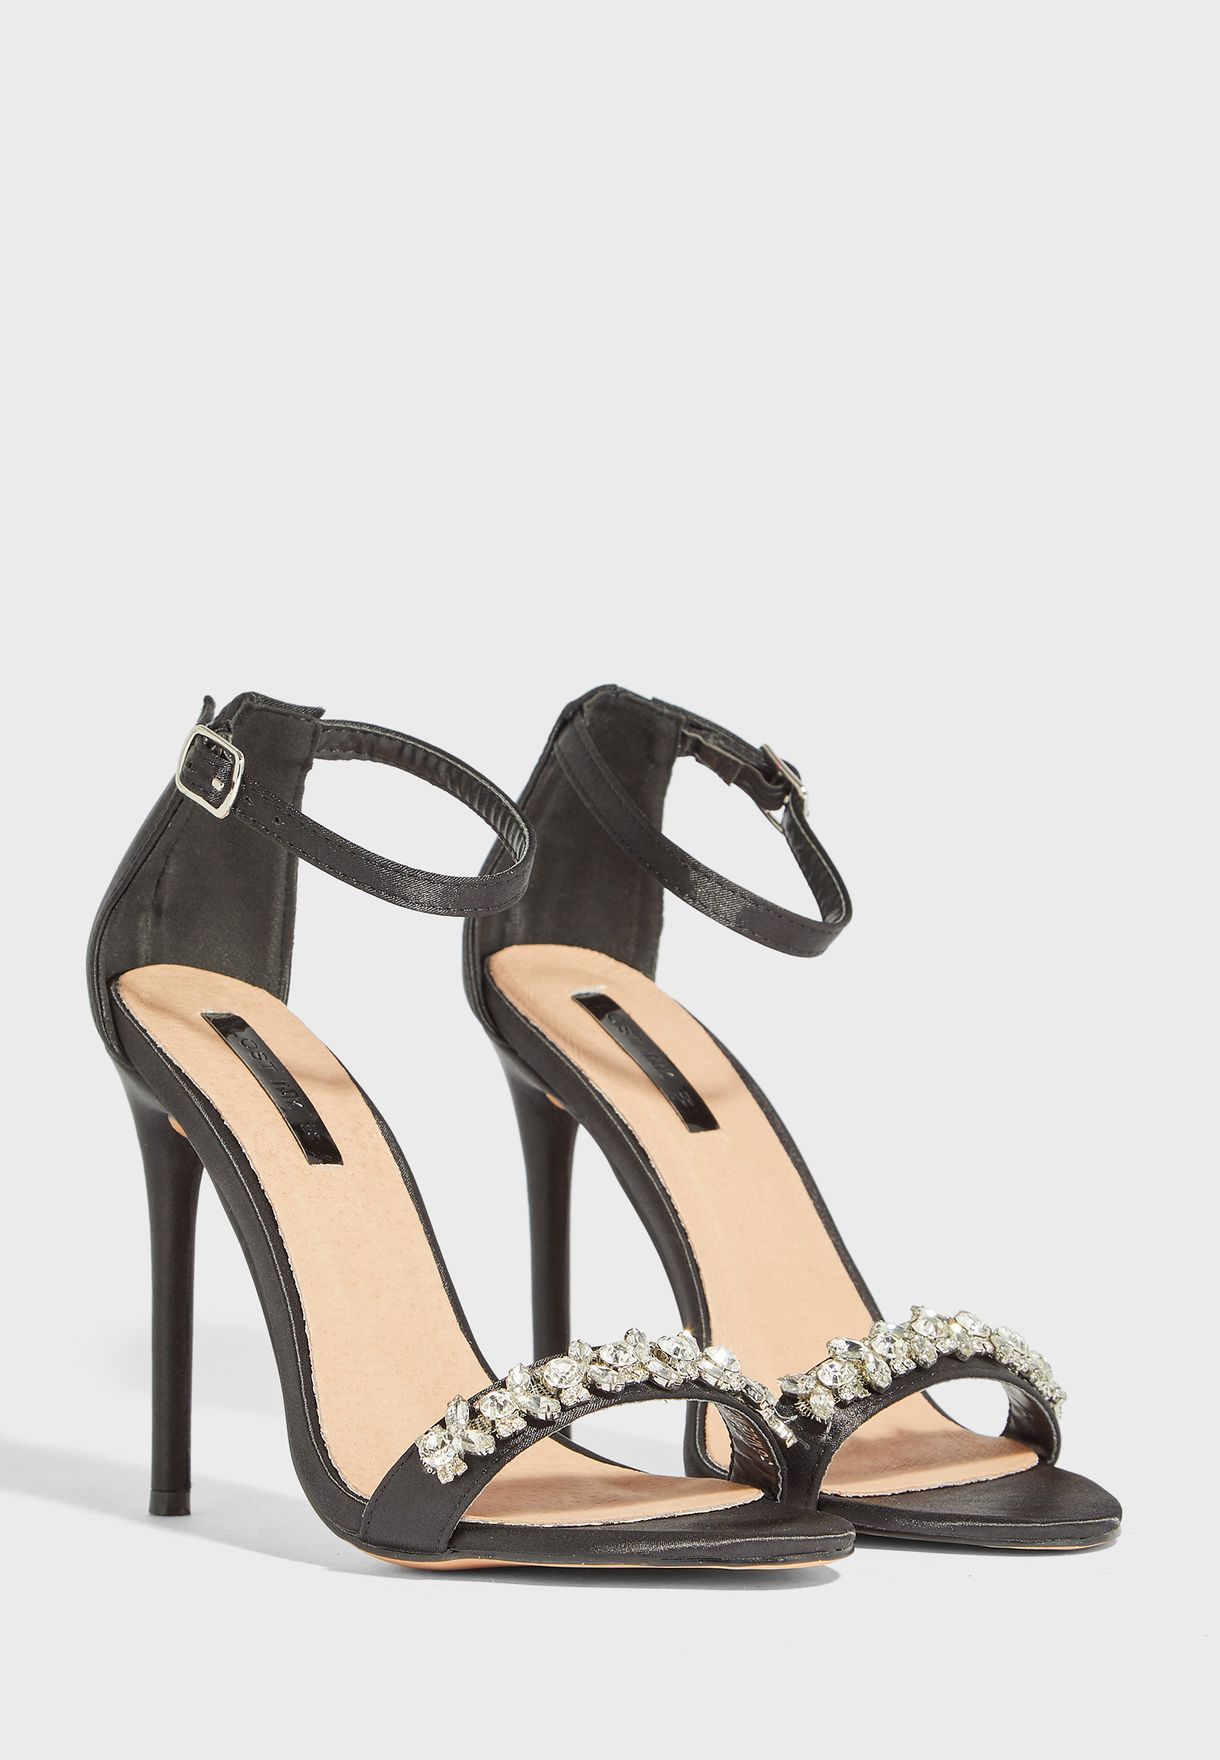 WIDE FIT Ankle Strap Sandal